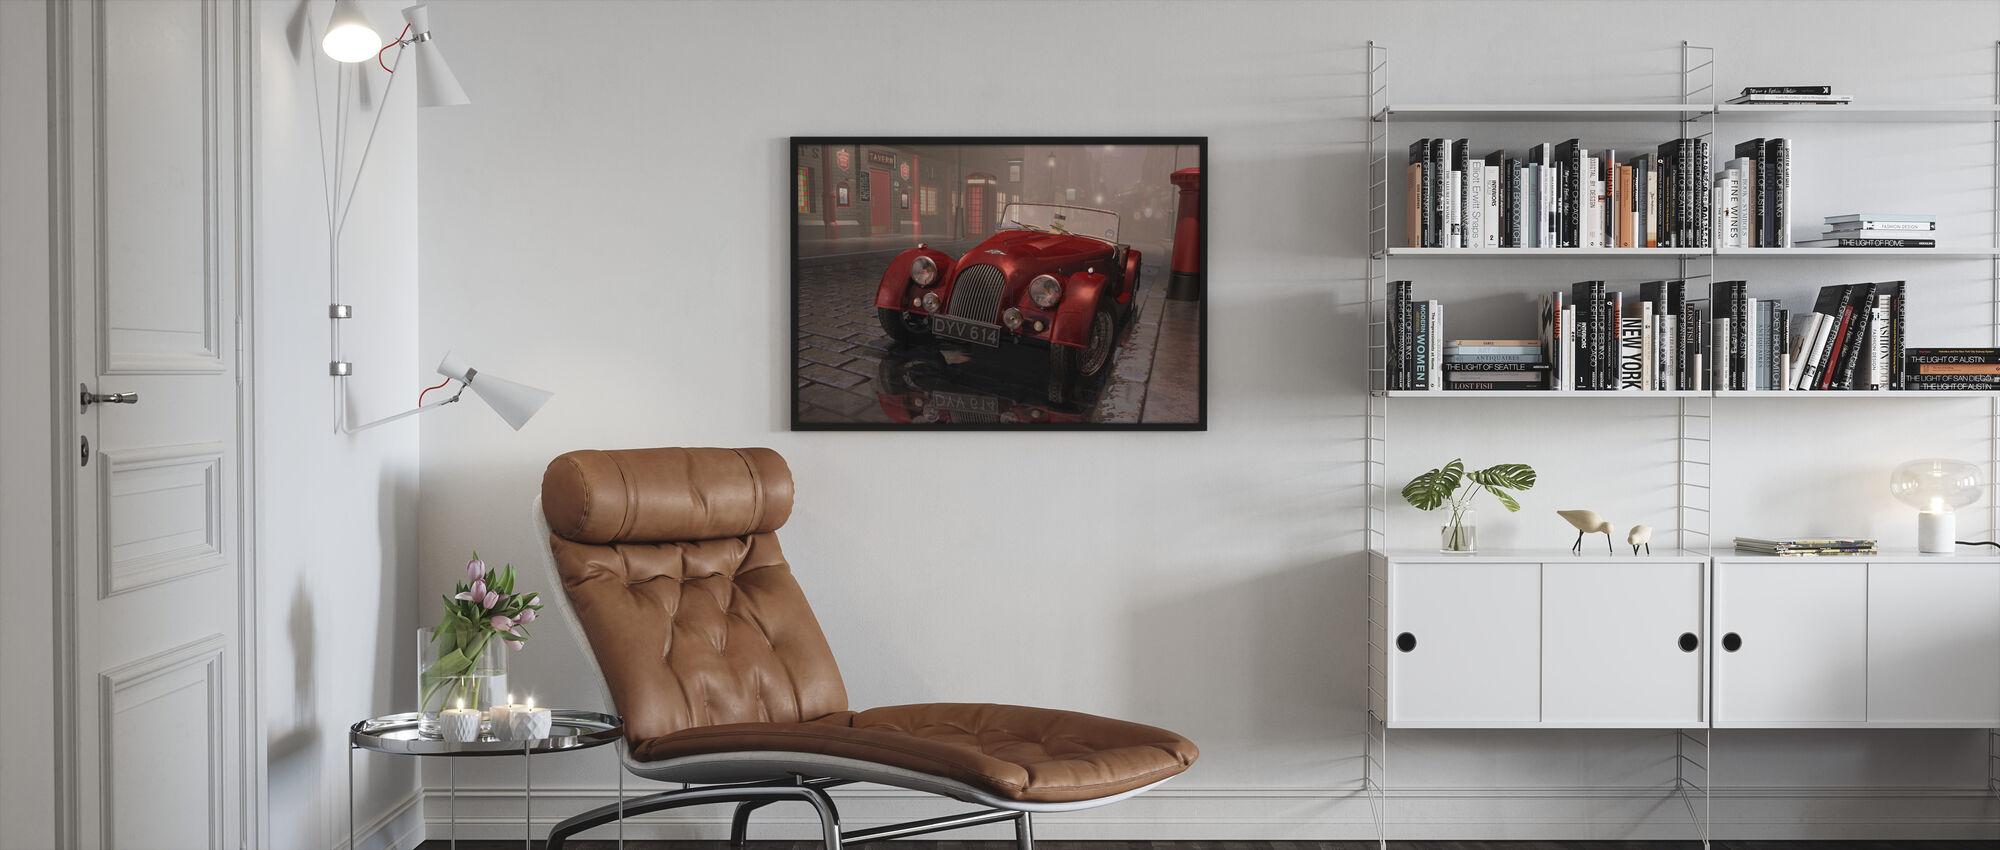 British Sports Car in London - Framed print - Living Room